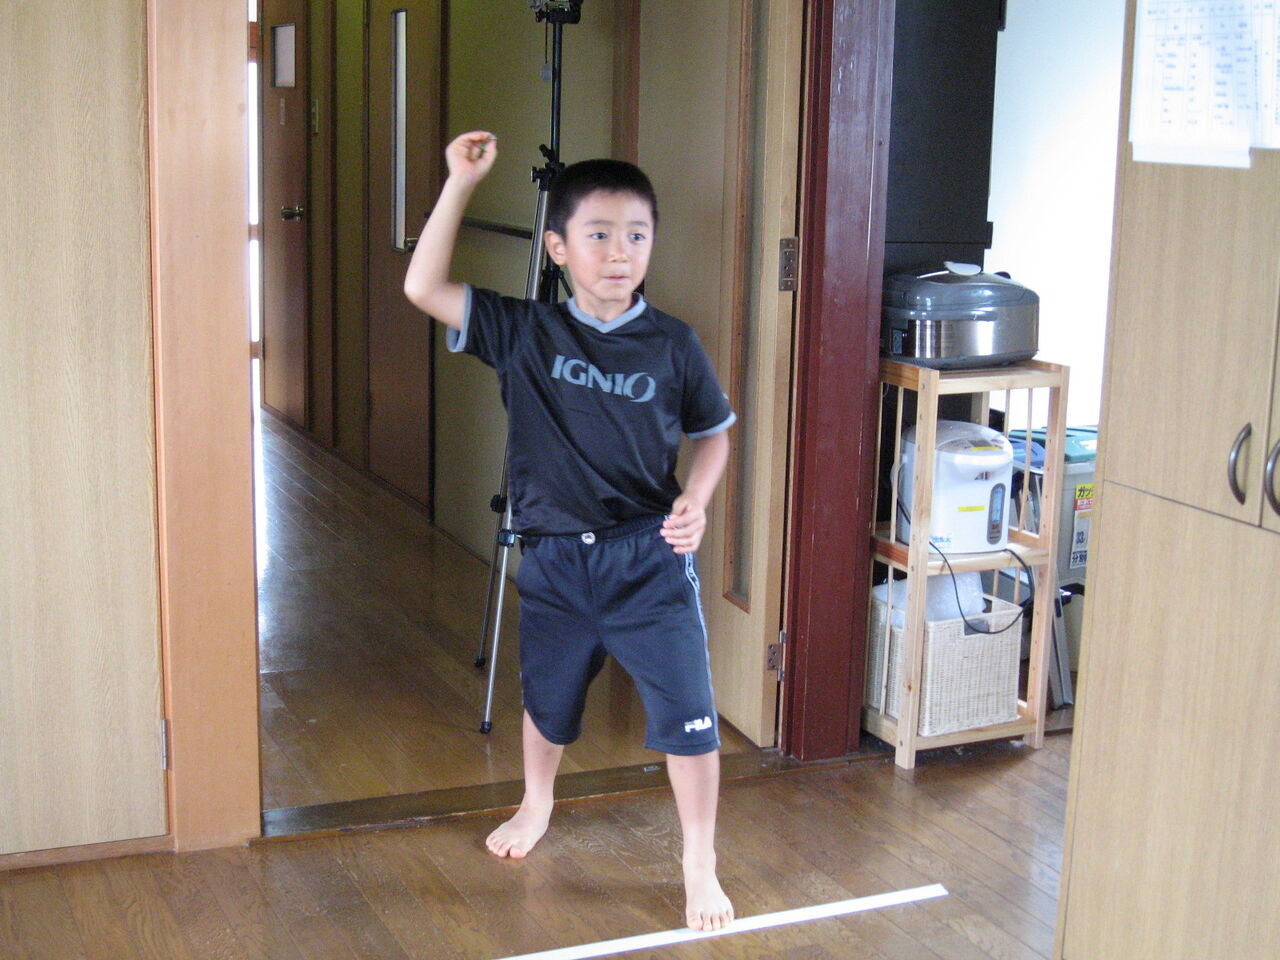 https://livedoor.blogimg.jp/ikouyou_1204/imgs/7/f/7f1e096d.jpg